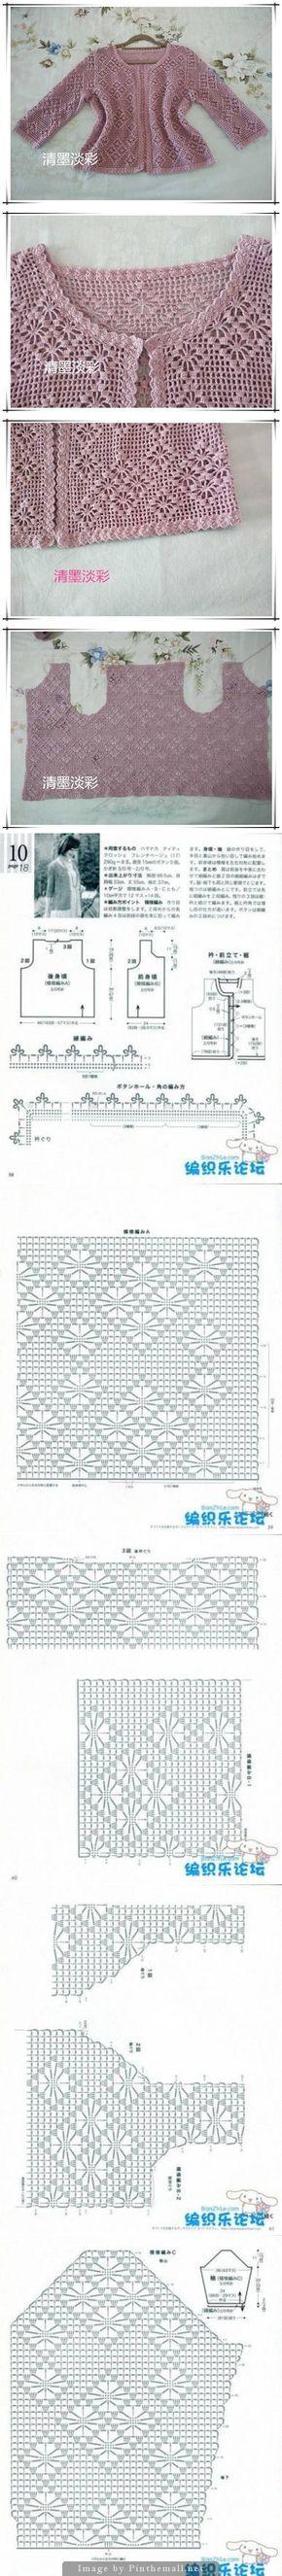 Filet crochet lace jacket with spider design ~~ http://www.liveinternet.ru/users/4729689/post339877732/